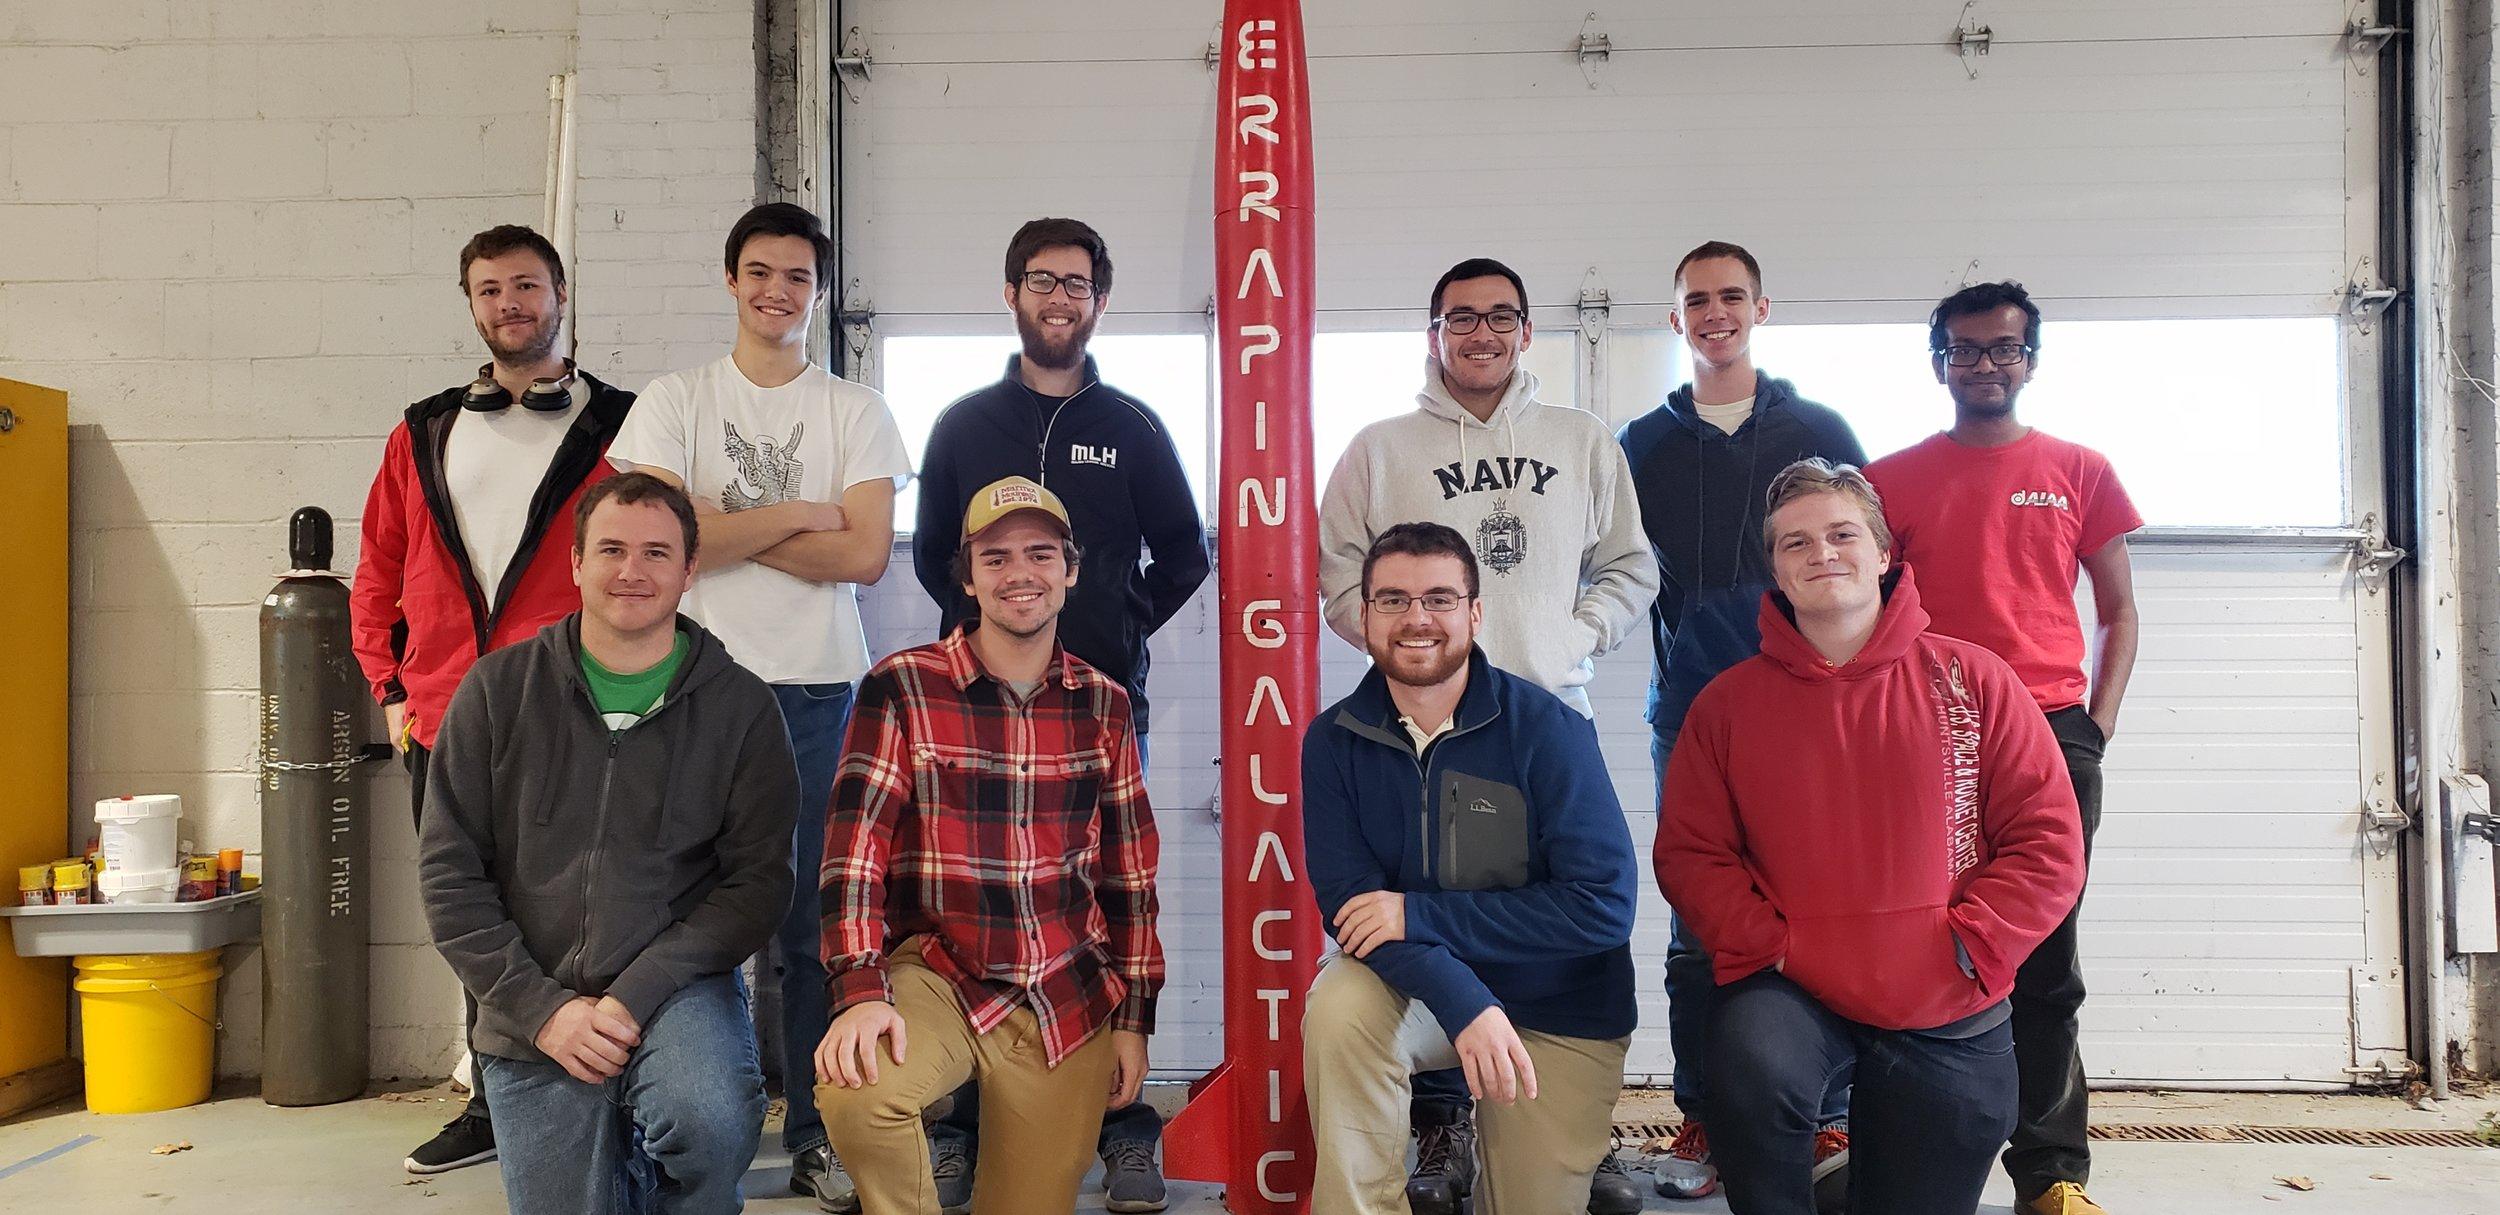 (Back: Colin, Kyle, Justin, Ben, Matt, Abhishek)  (Front: Eliott, Adam, John, Theo) (Missing: Ryland, Dan)